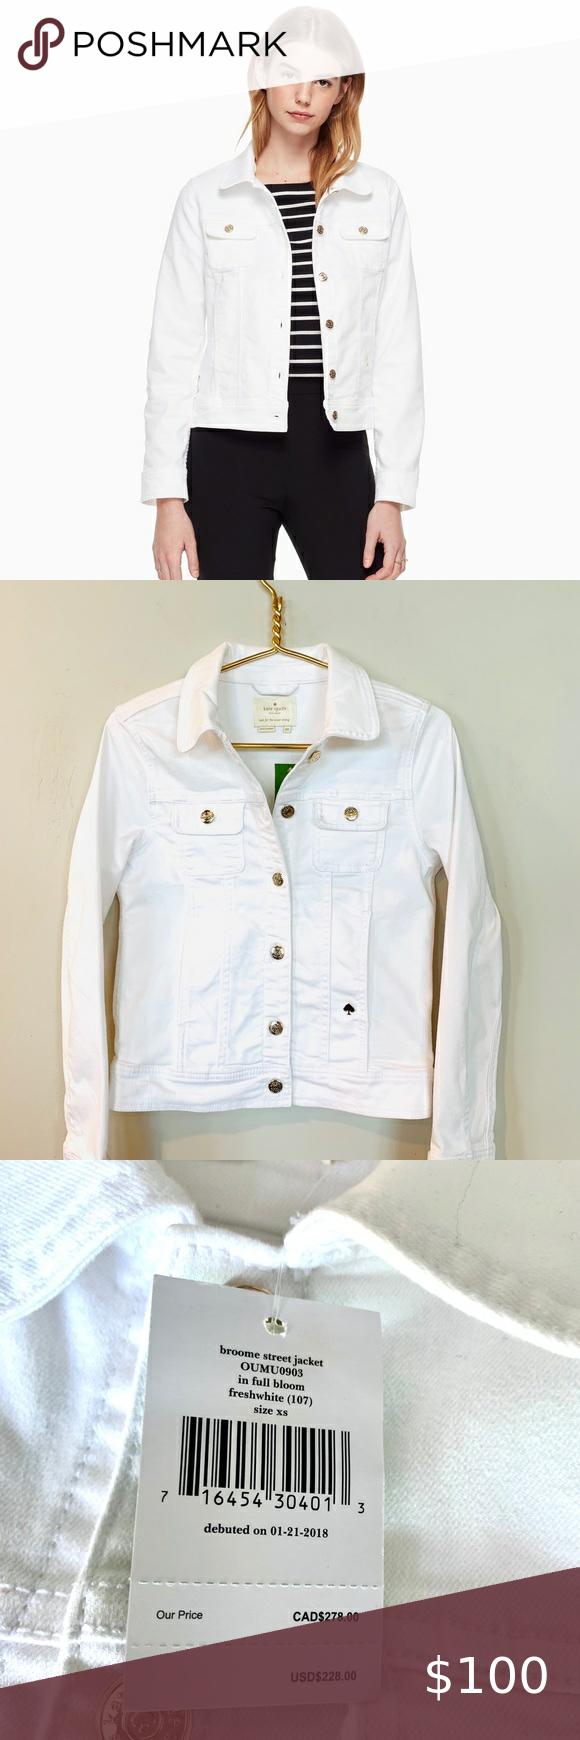 Kate Spade Broome St Fresh White Jean Jacket Xs Kate Spade Broome Street Denim Jacket Brand N White Jean Jacket Jackets Jean Jacket [ 1740 x 580 Pixel ]